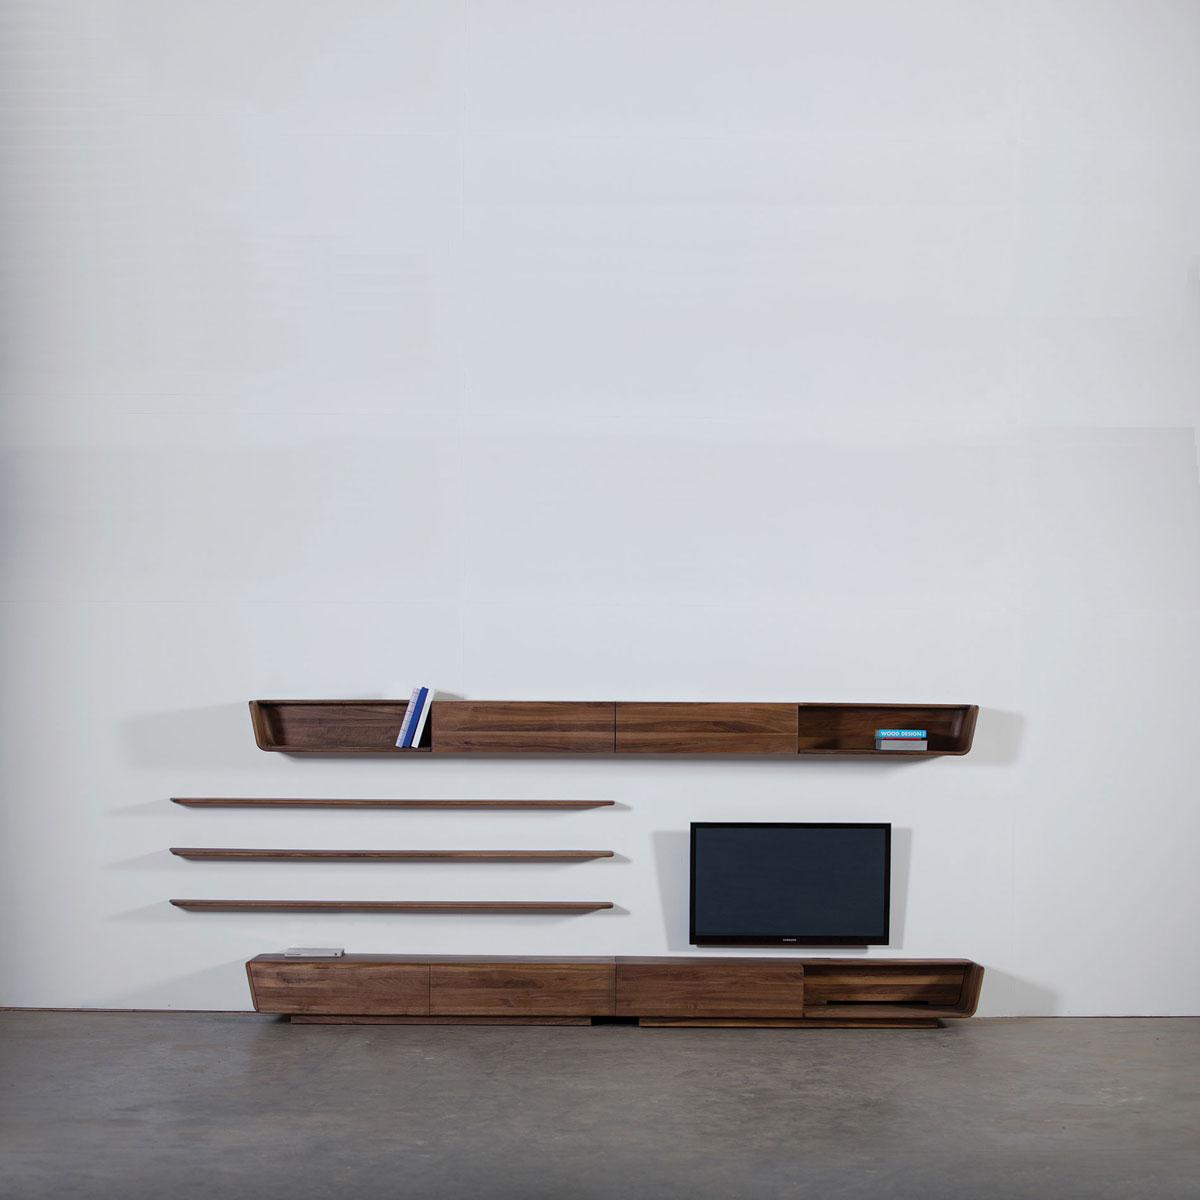 Mueble Modular Latus Pared En Madera De Diseno Vanguardista Europeo - Pared-de-madera